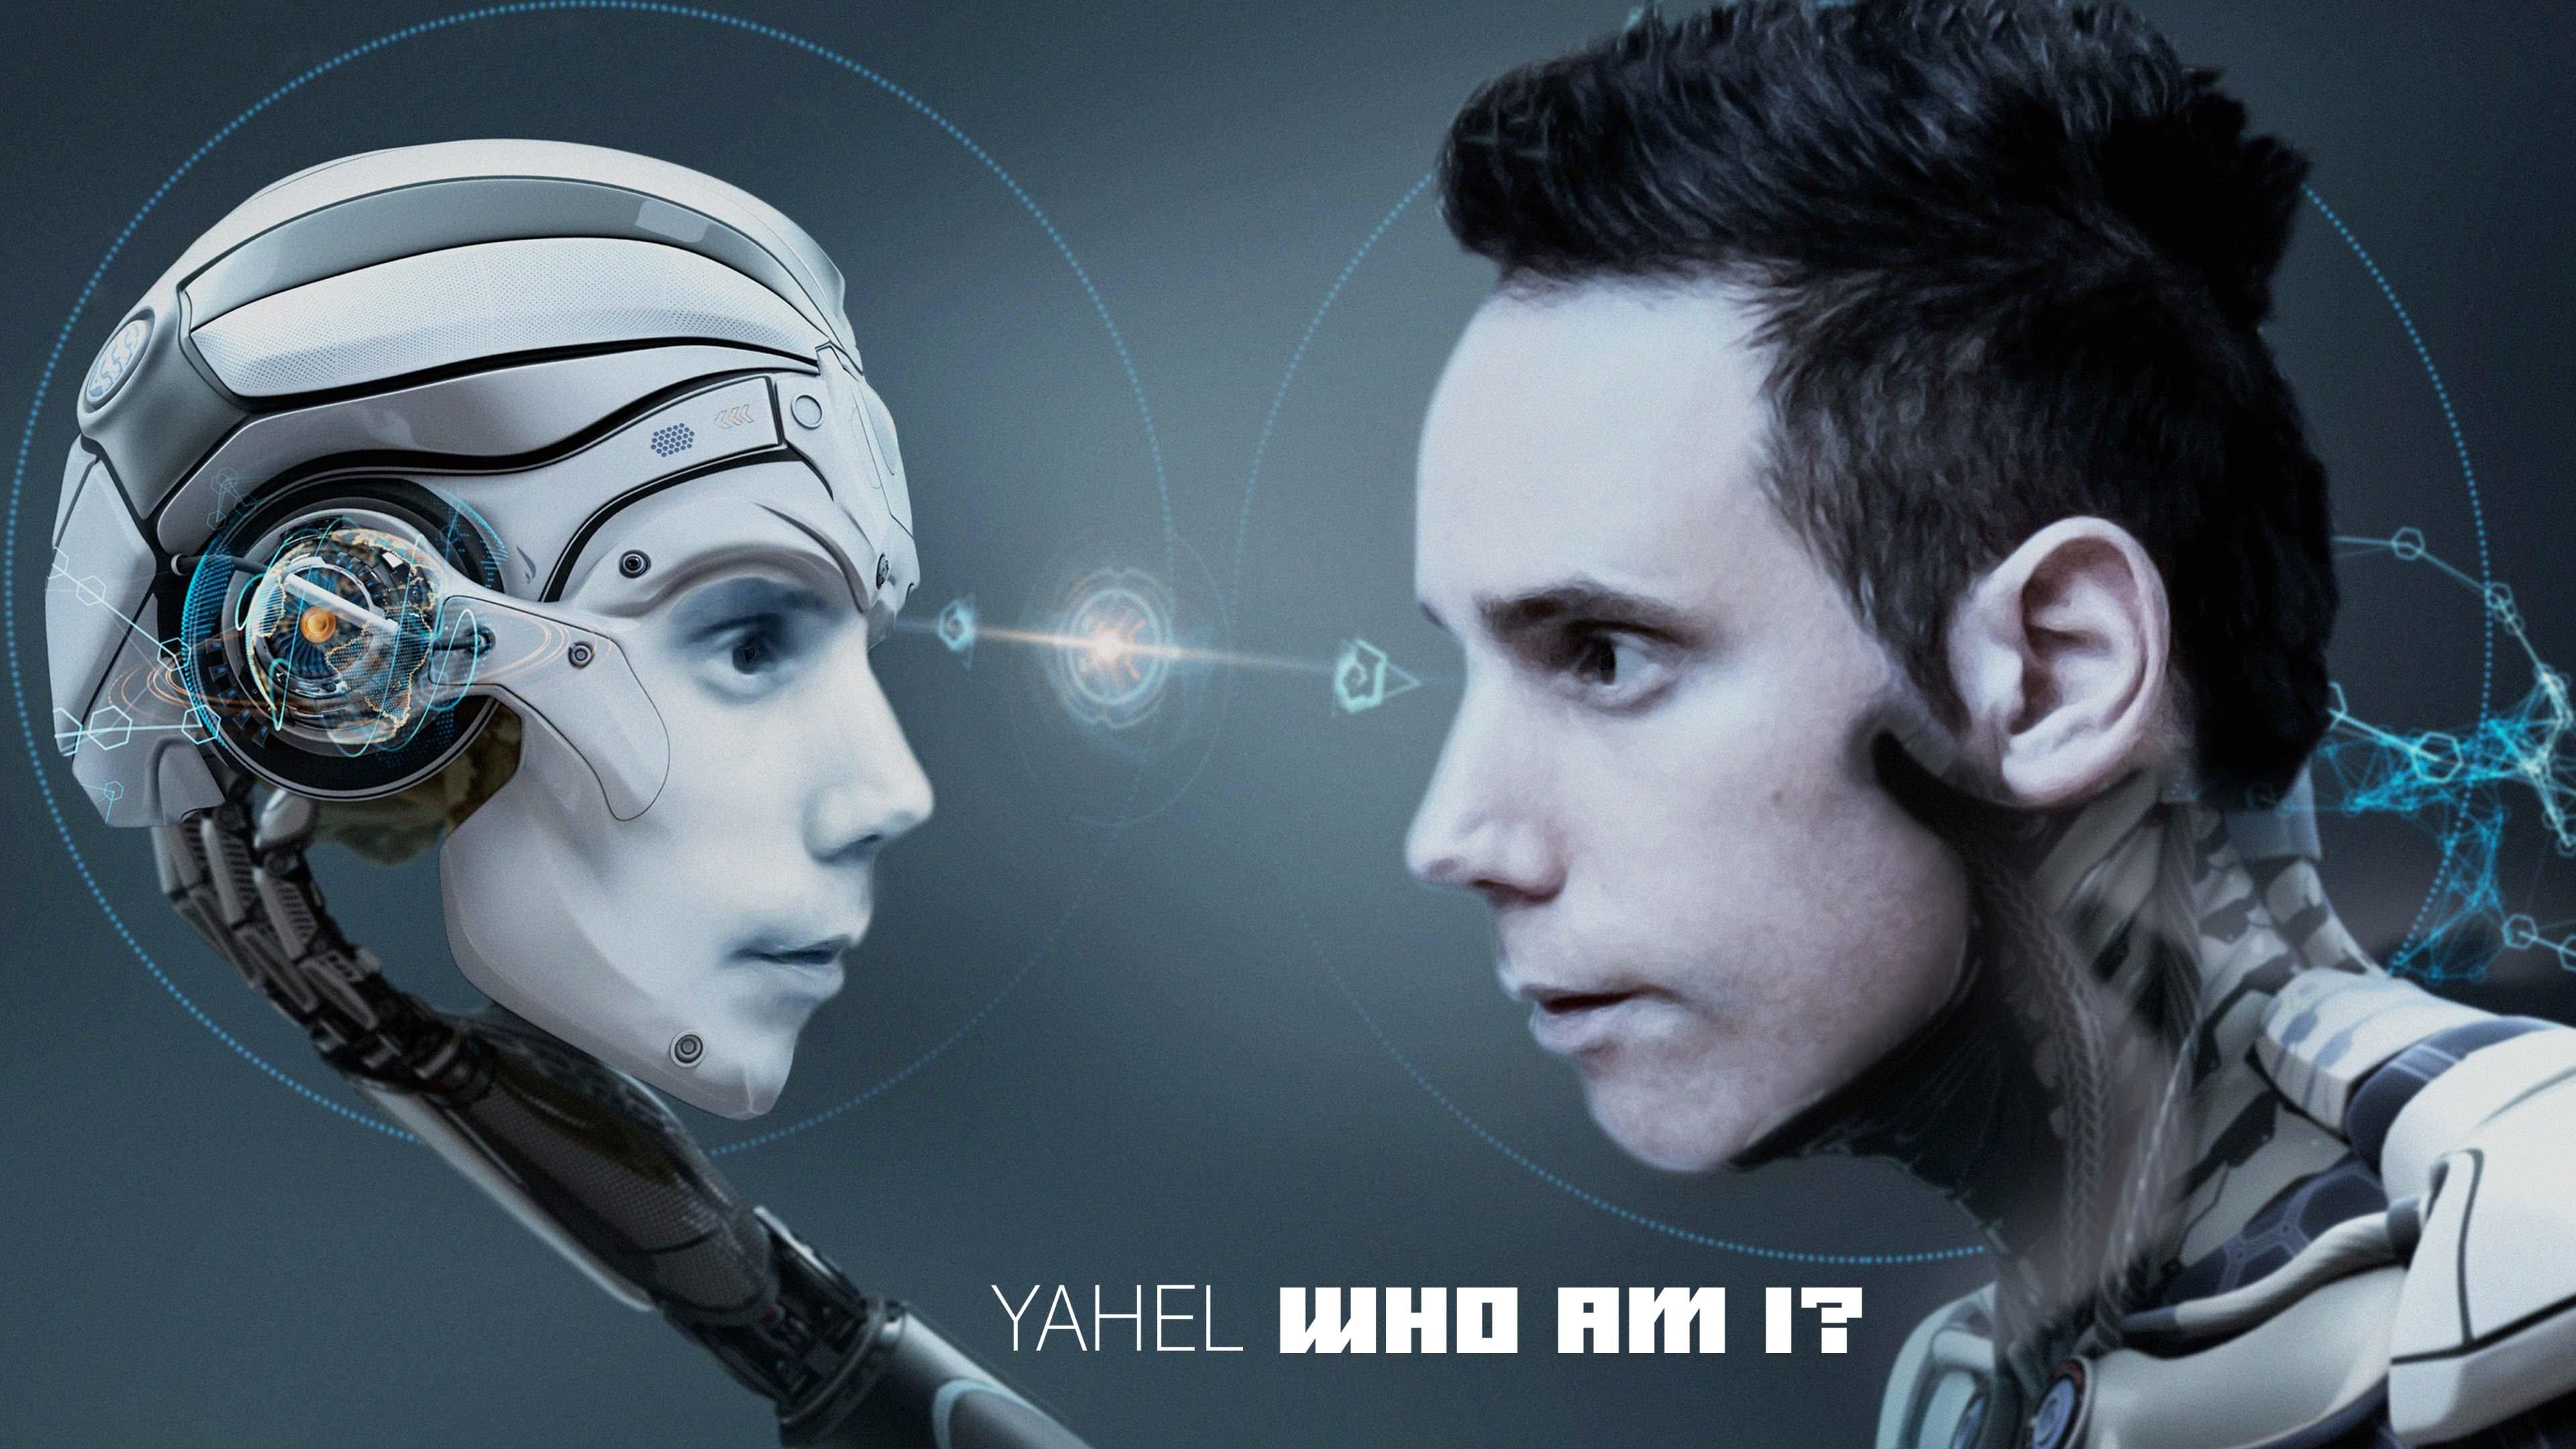 Yahel Who Am I